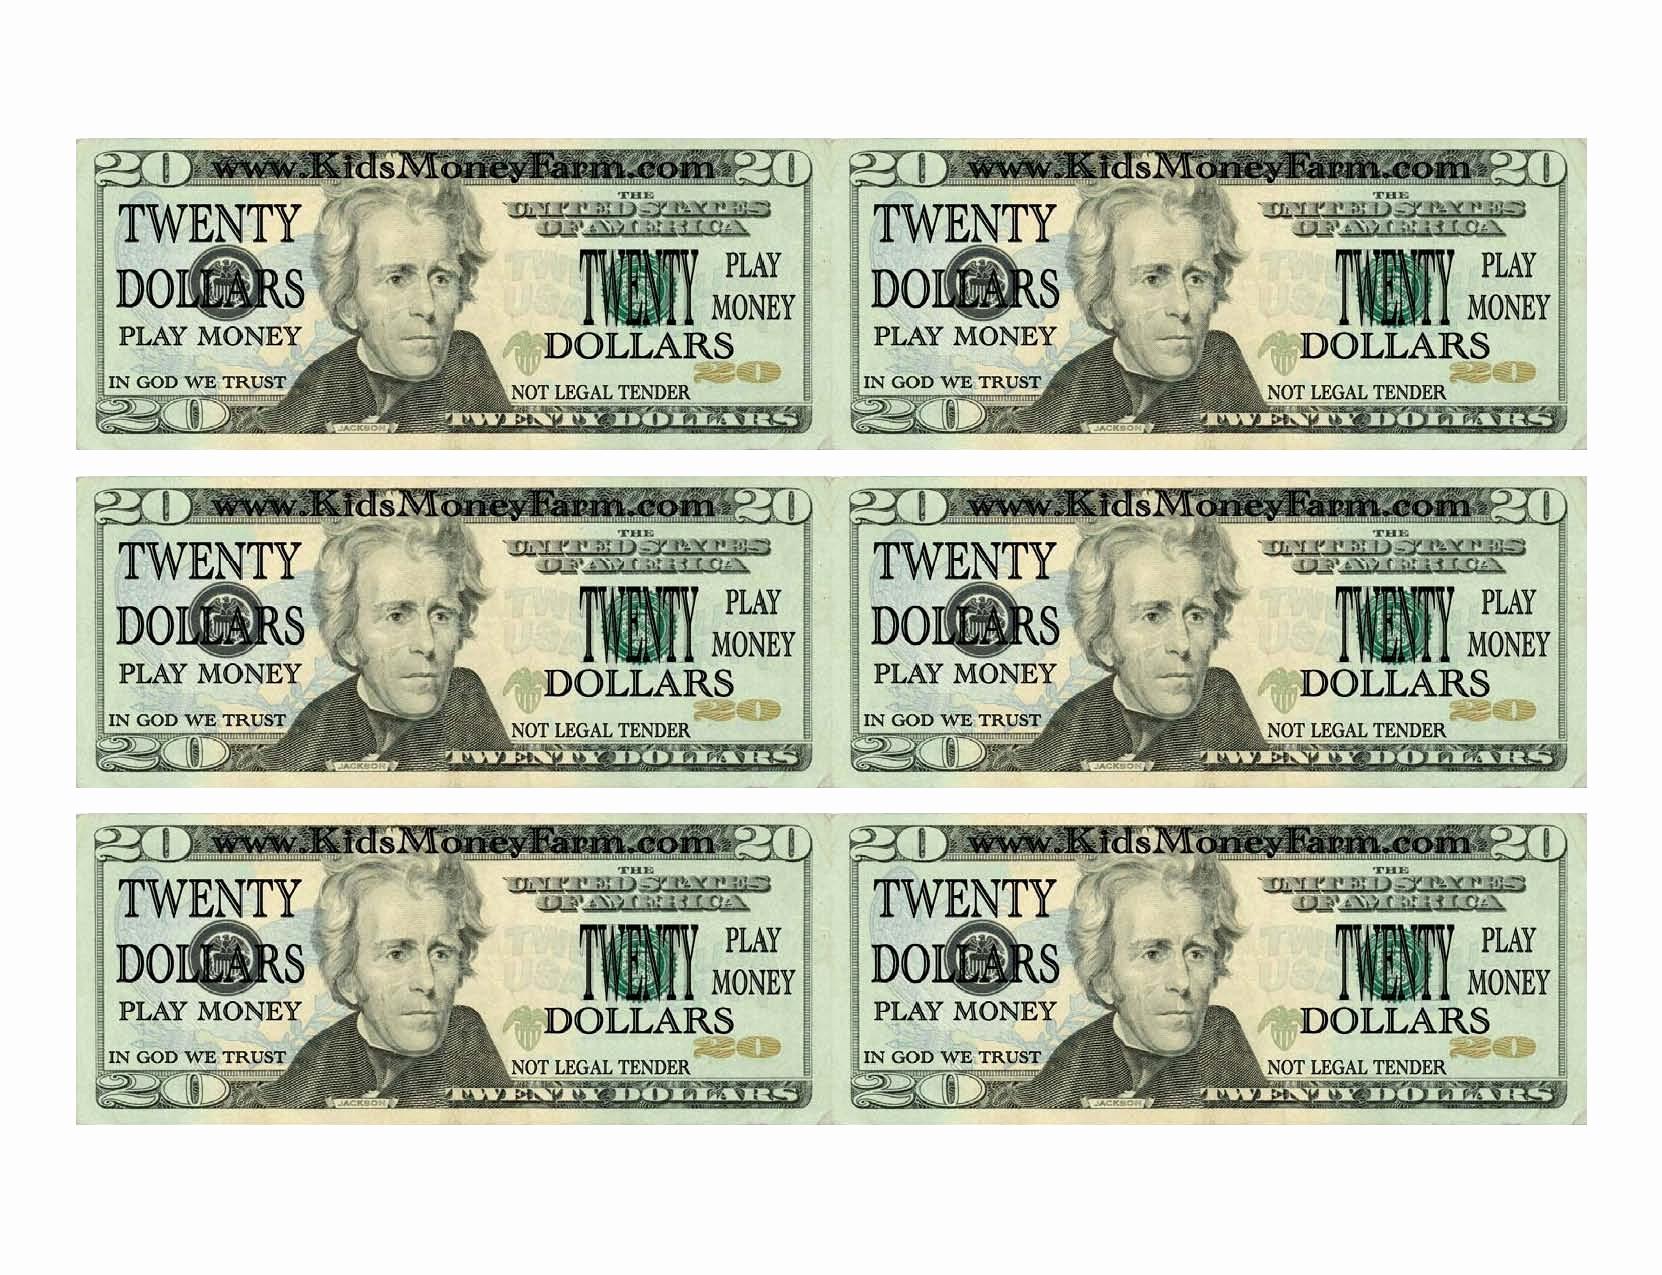 Printable Fake Money Templates Lovely 7 Best Of Printable Play Money - Free Printable Play Dollar Bills